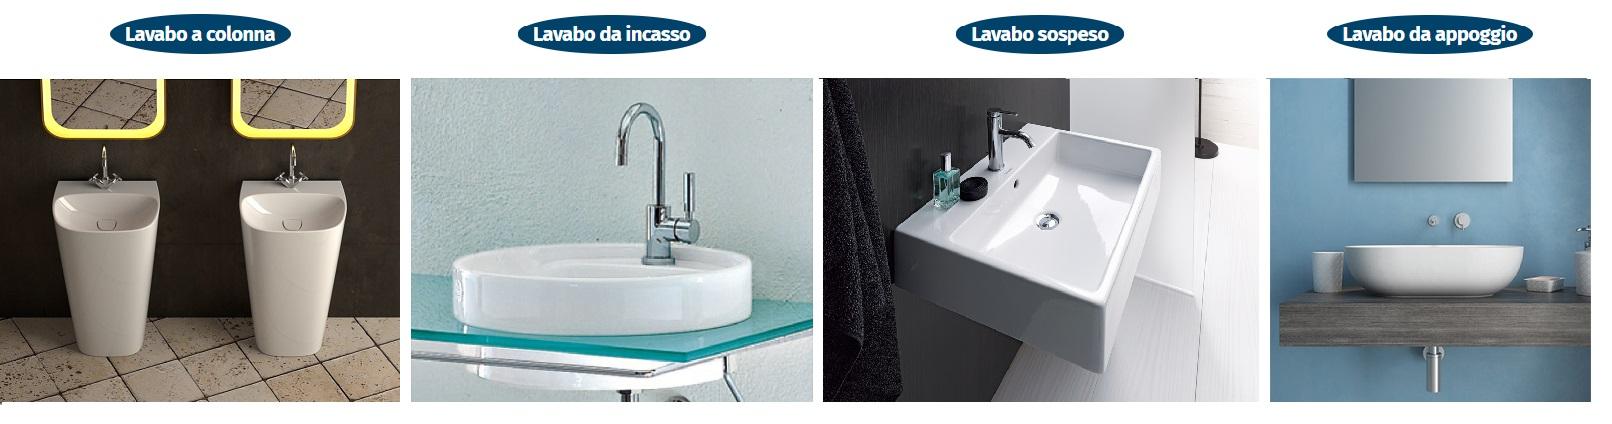 tipologie di lavabo